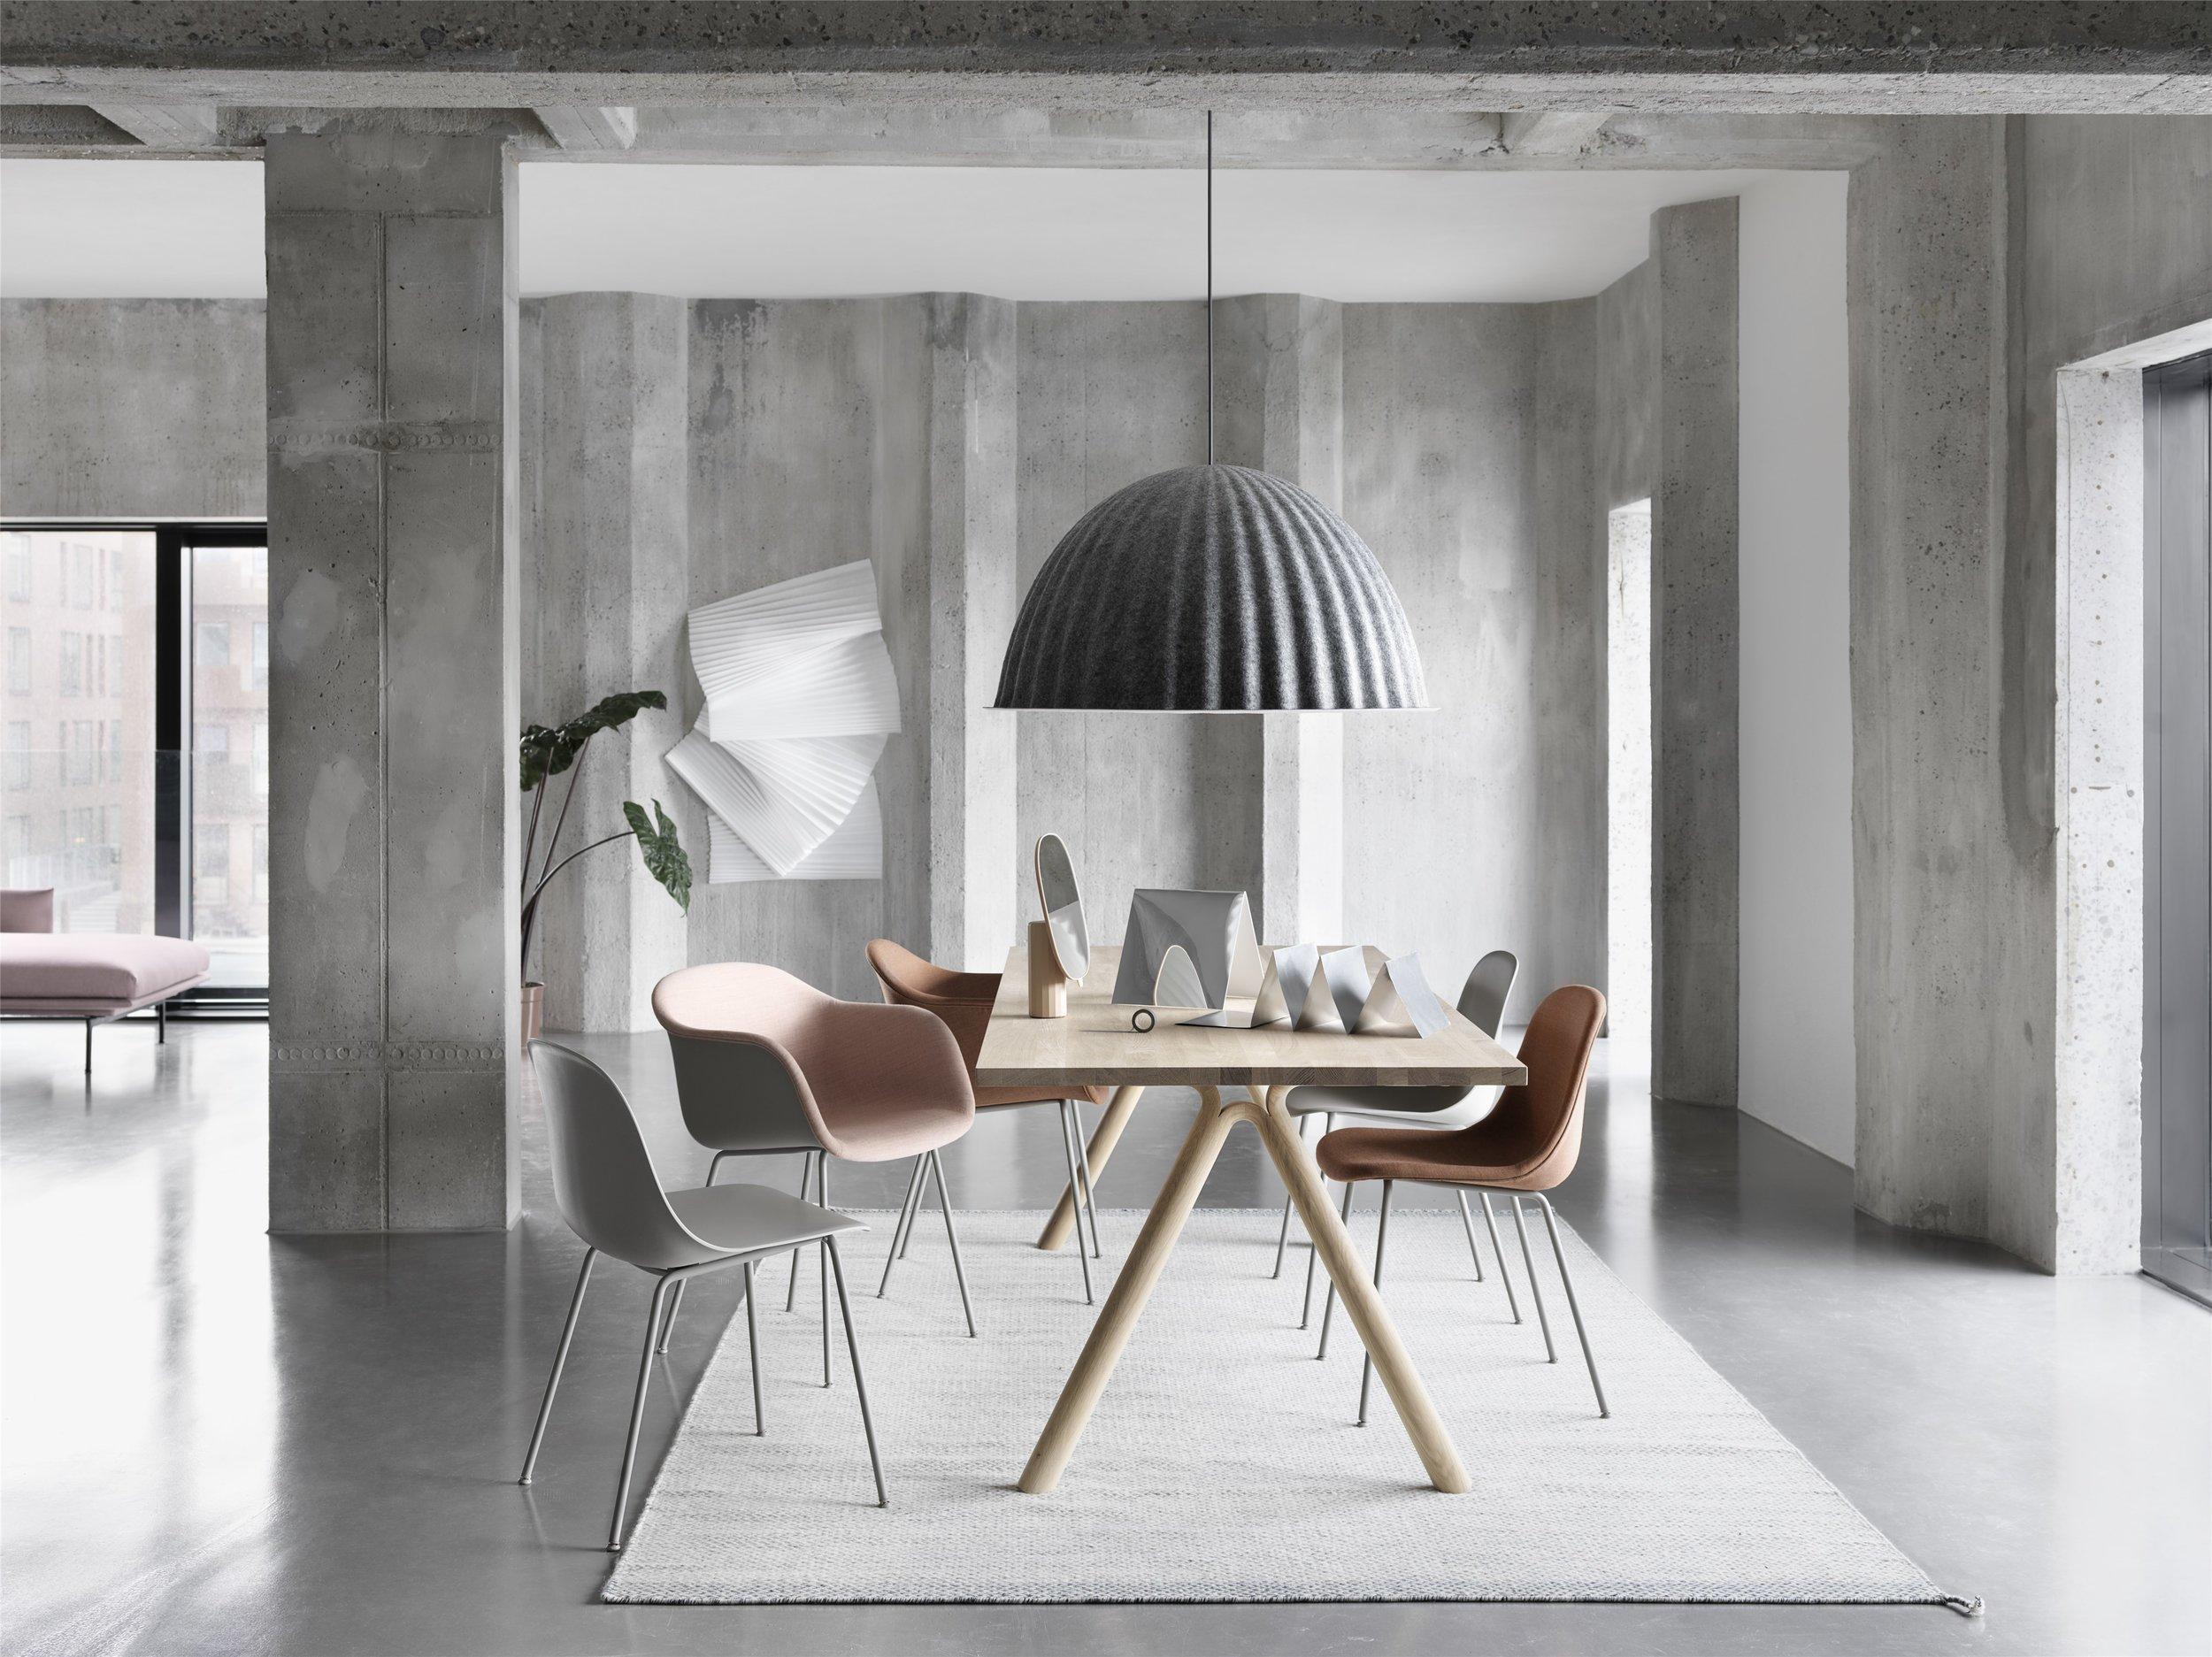 Split-Table-Fiber-Side-Armchair-tube-front-upholstery-Mimic-Under-The-Bell-wide-org_(150).jpg